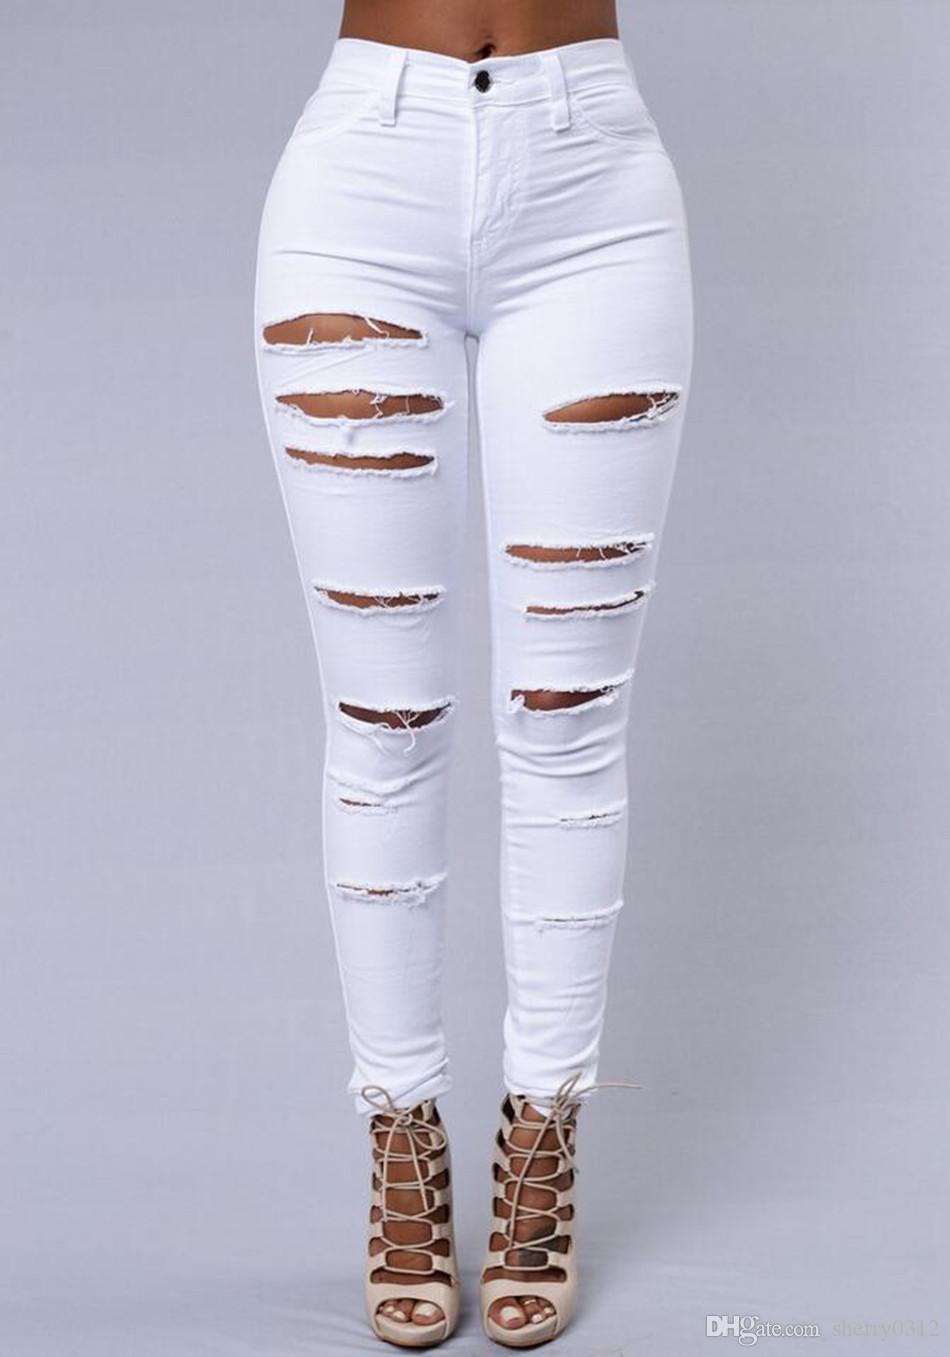 2019 New Jeans For women Boyfriend Pencil Skinny Denim Jeans Womens High Waist Ripped Black Jeans Big Girls Casual Legging Skinny trousers